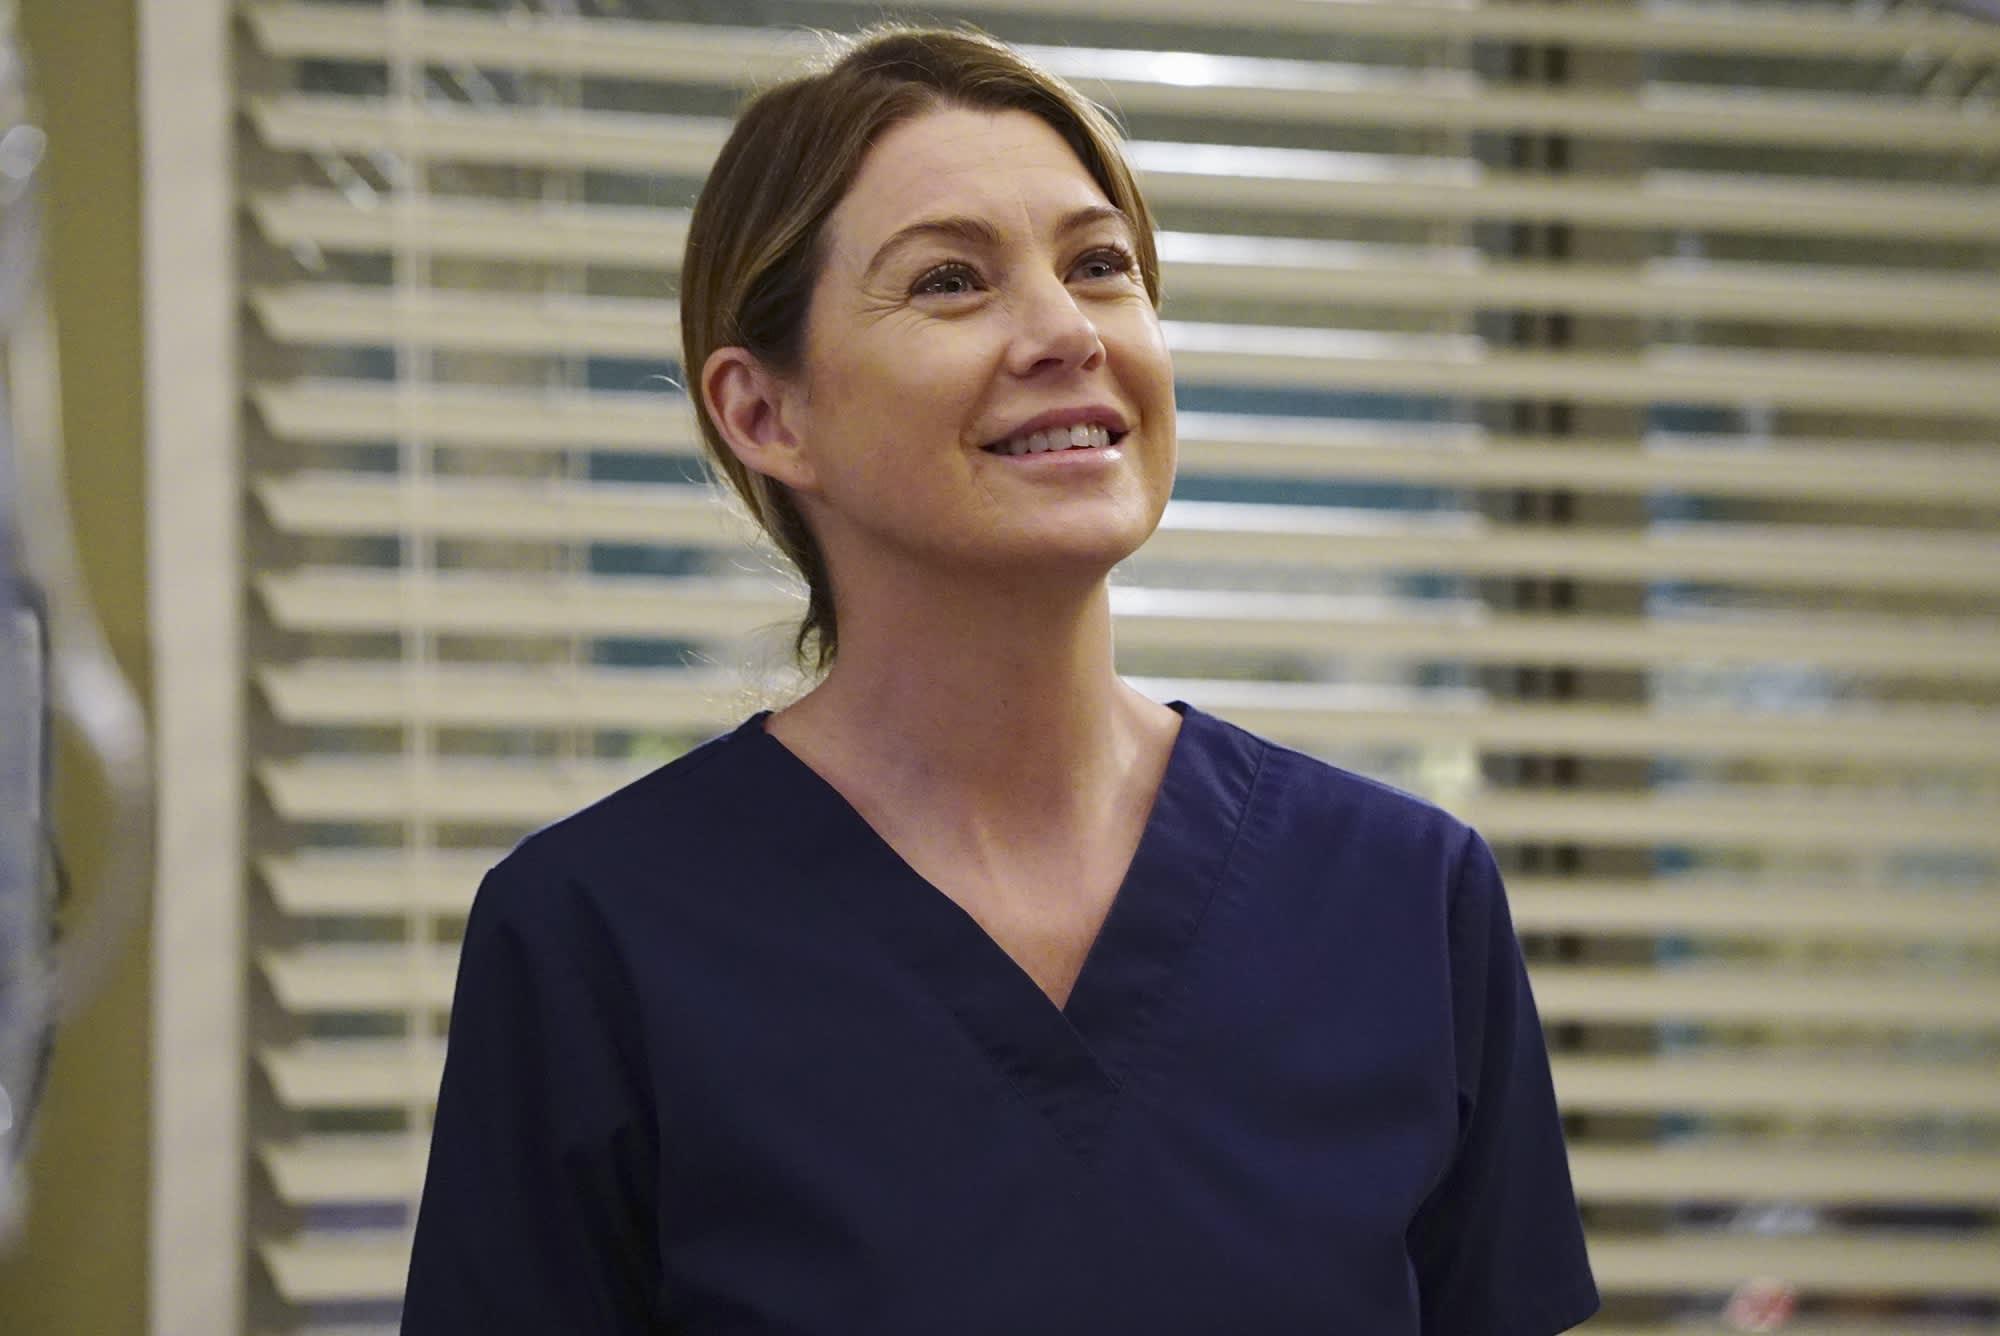 Greys Anatomy Star Ellen Pompeo Earns Over 20 Million A Year